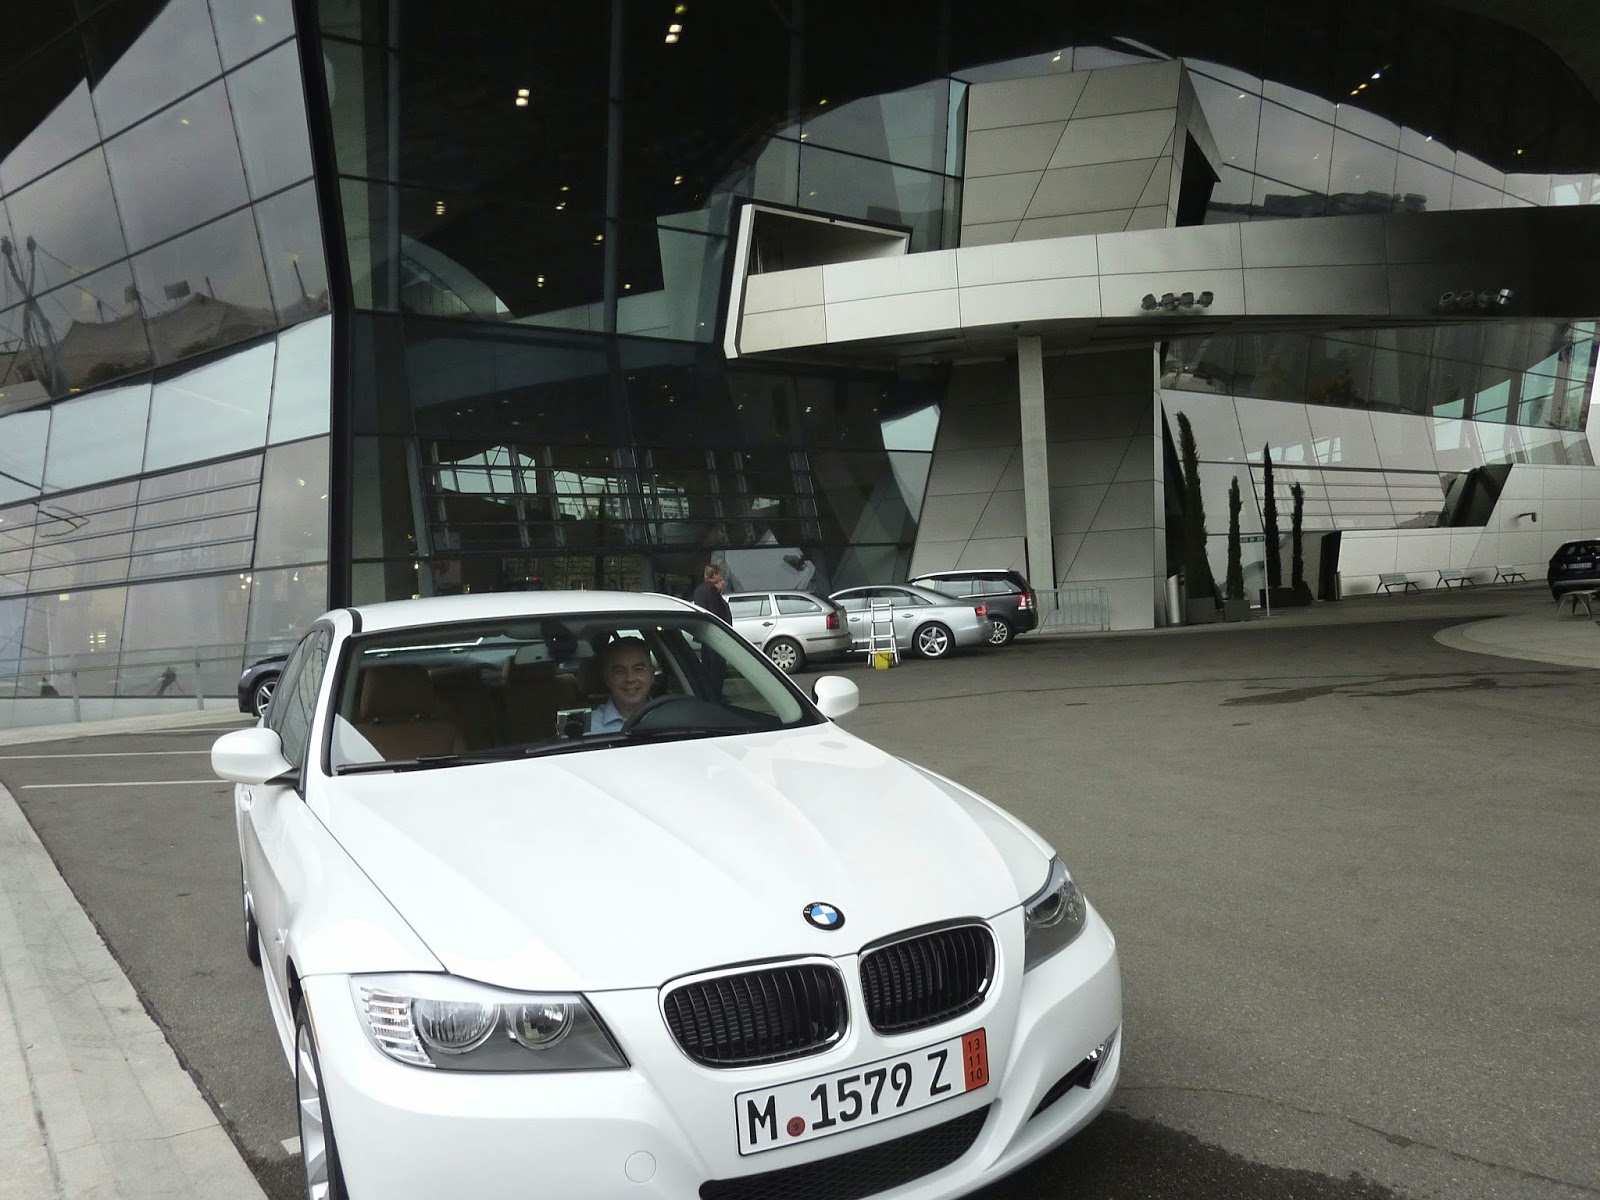 2010 bmw e90 sedan [ 1600 x 1200 Pixel ]